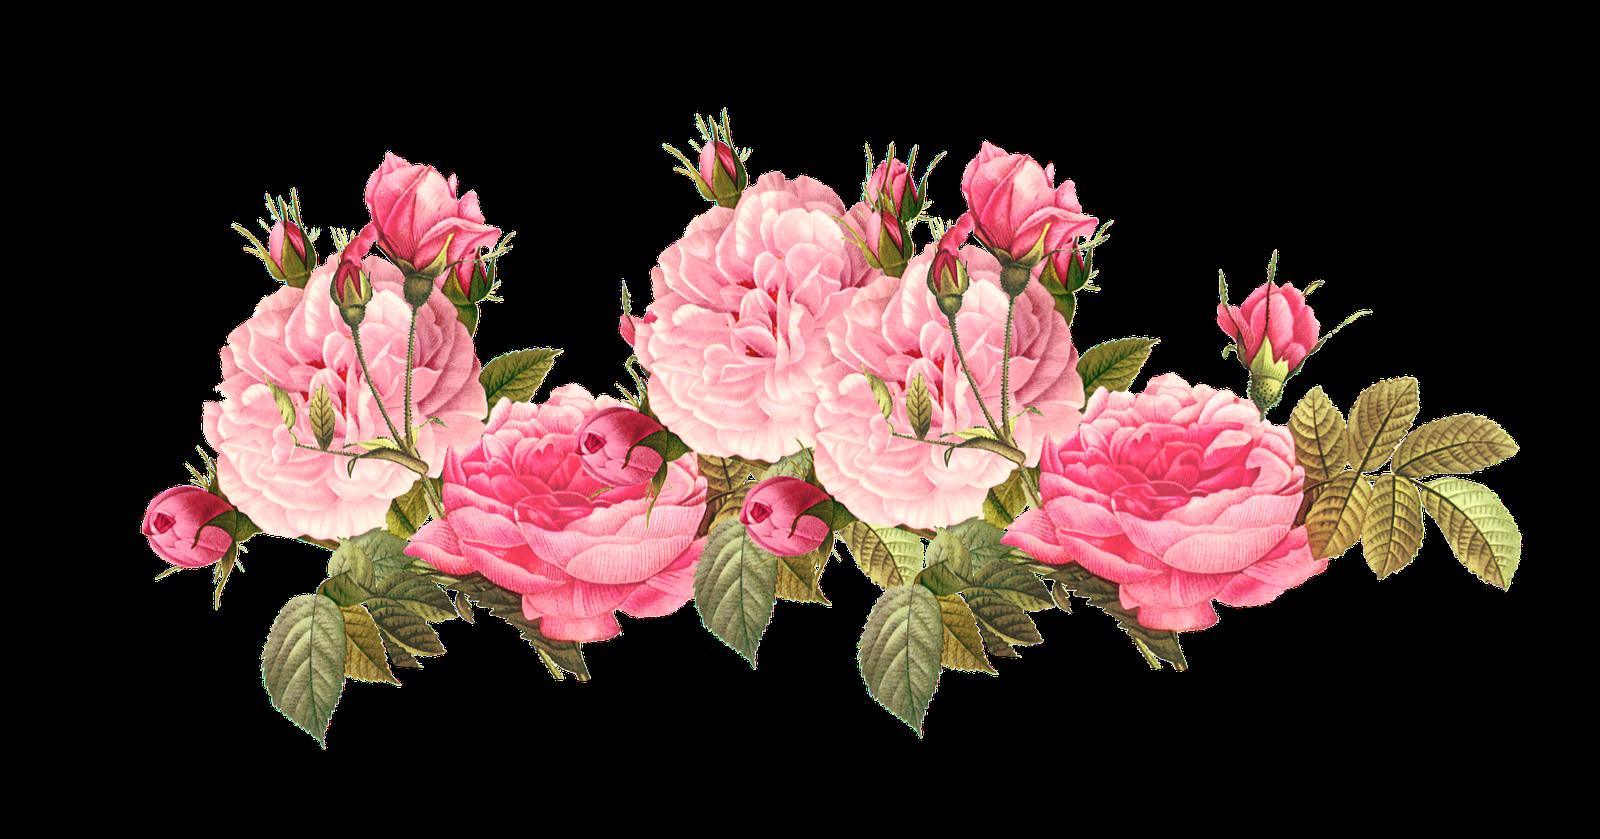 Vintage pink roses wallpapers. Flower png tumblr